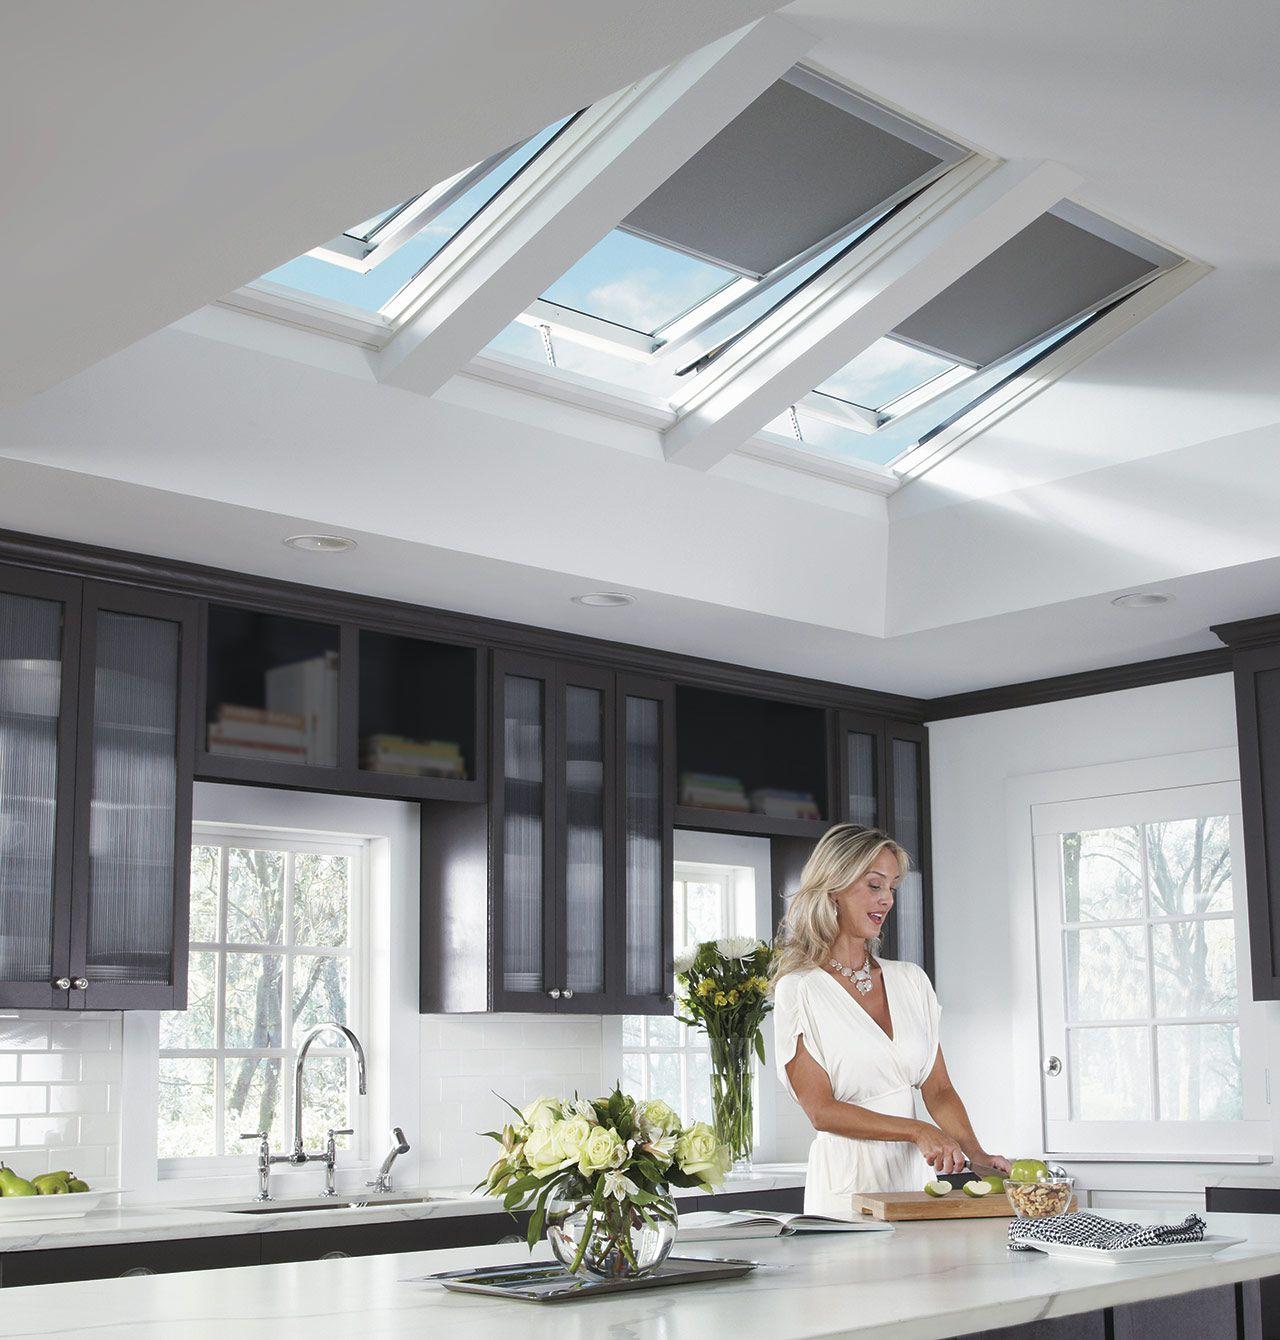 velux kitchen inspiration gallery of images skylight pinterest